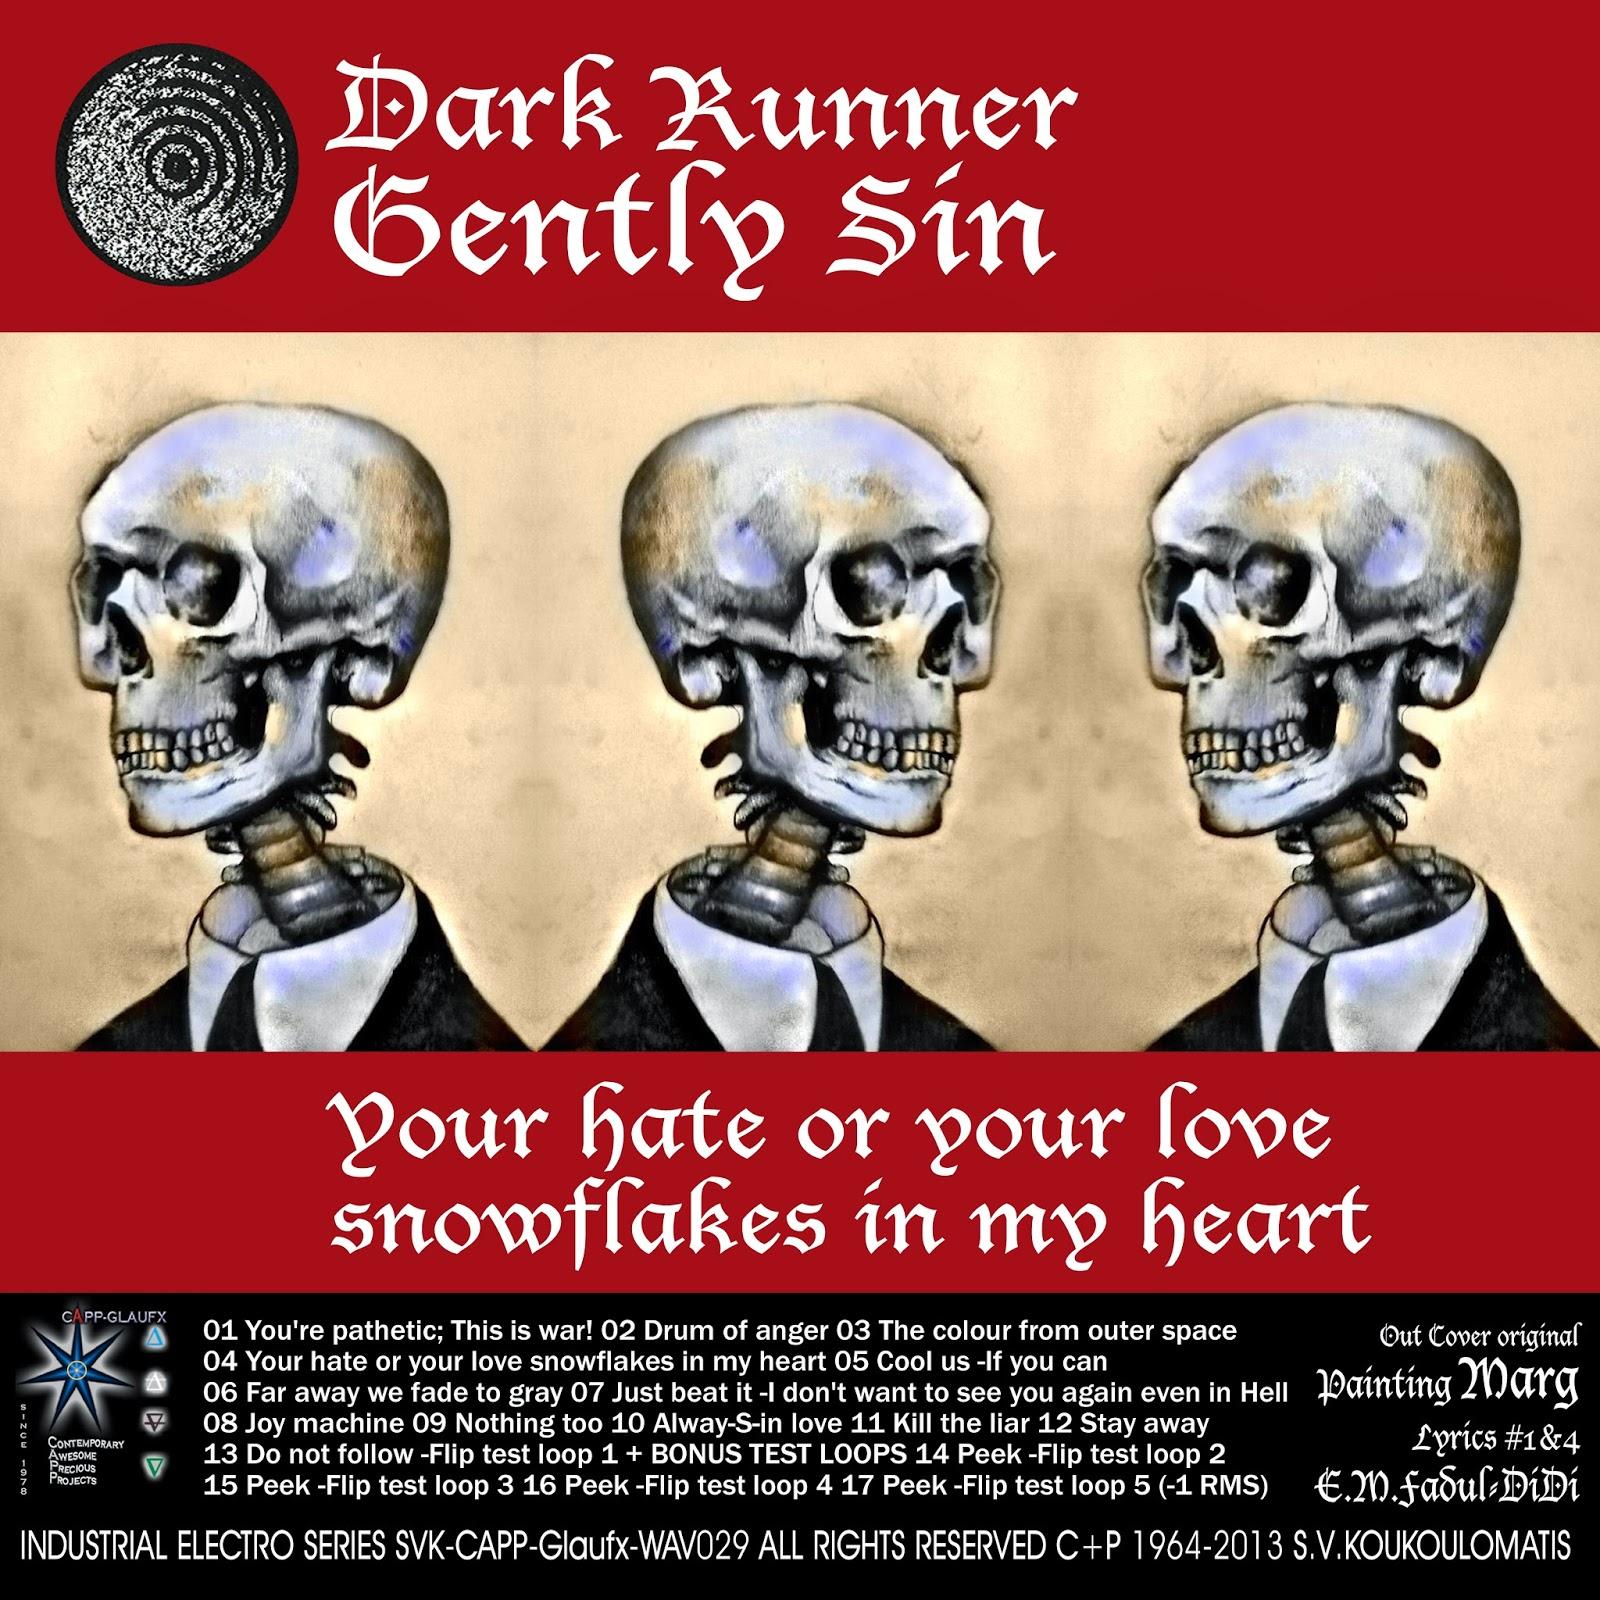 Dark Runner - Gently Sin